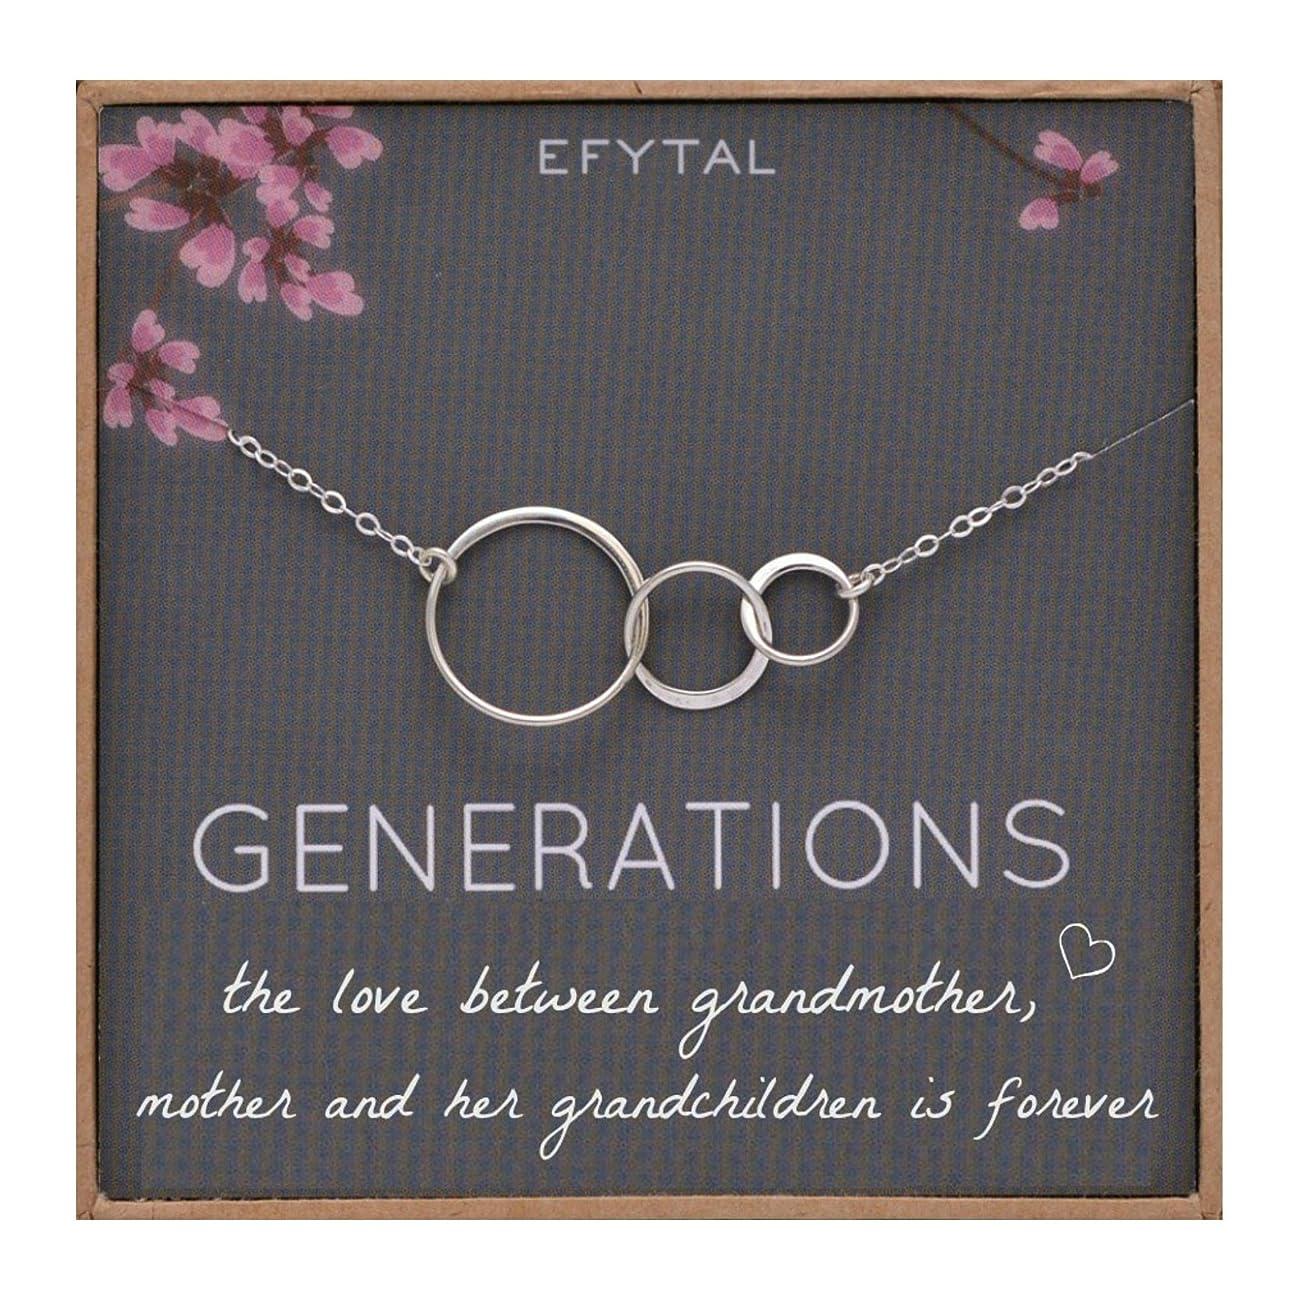 EFYTAL Generations Necklace for Grandma, Sterling Silver 3 Infinity Circles, Mom & Grandchildren